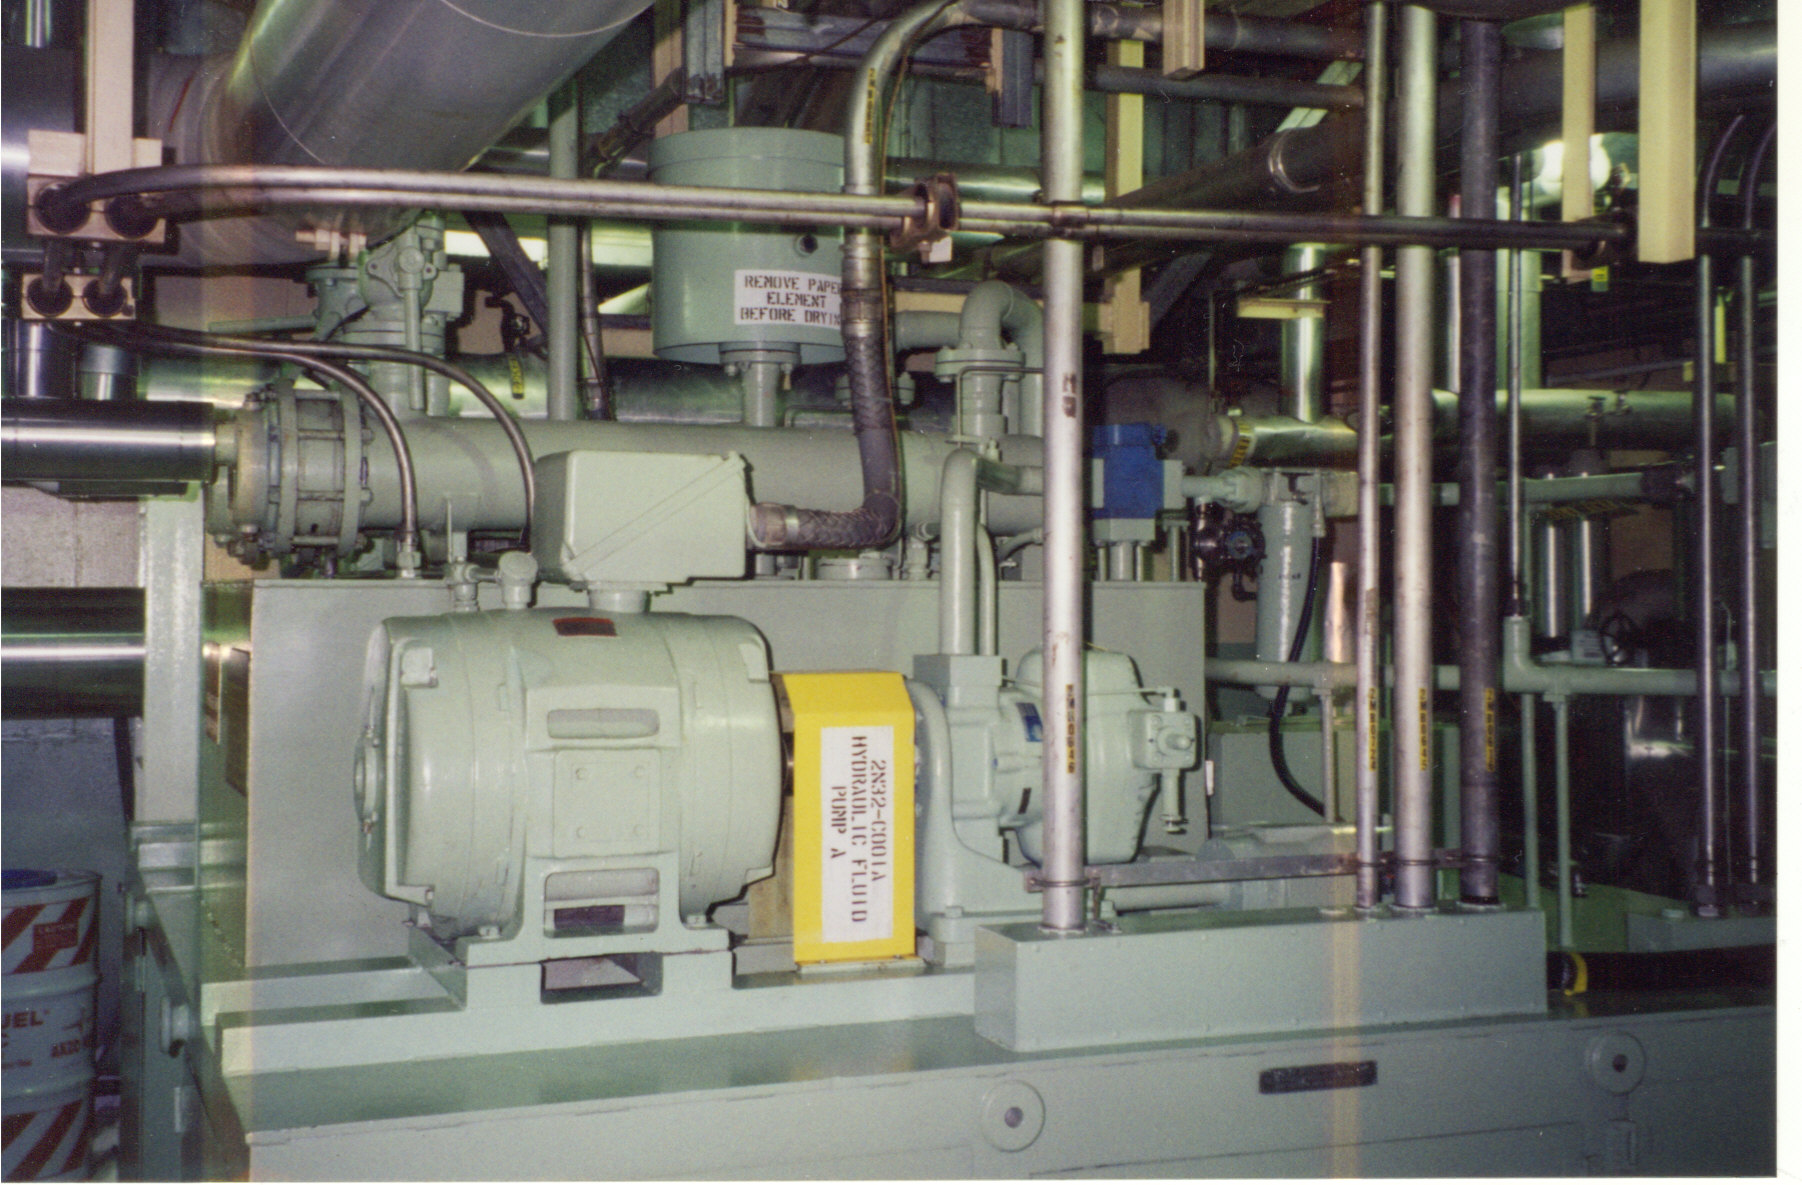 Reservoir using phosphate ester electro-hydraulic control (EHC) Fluids